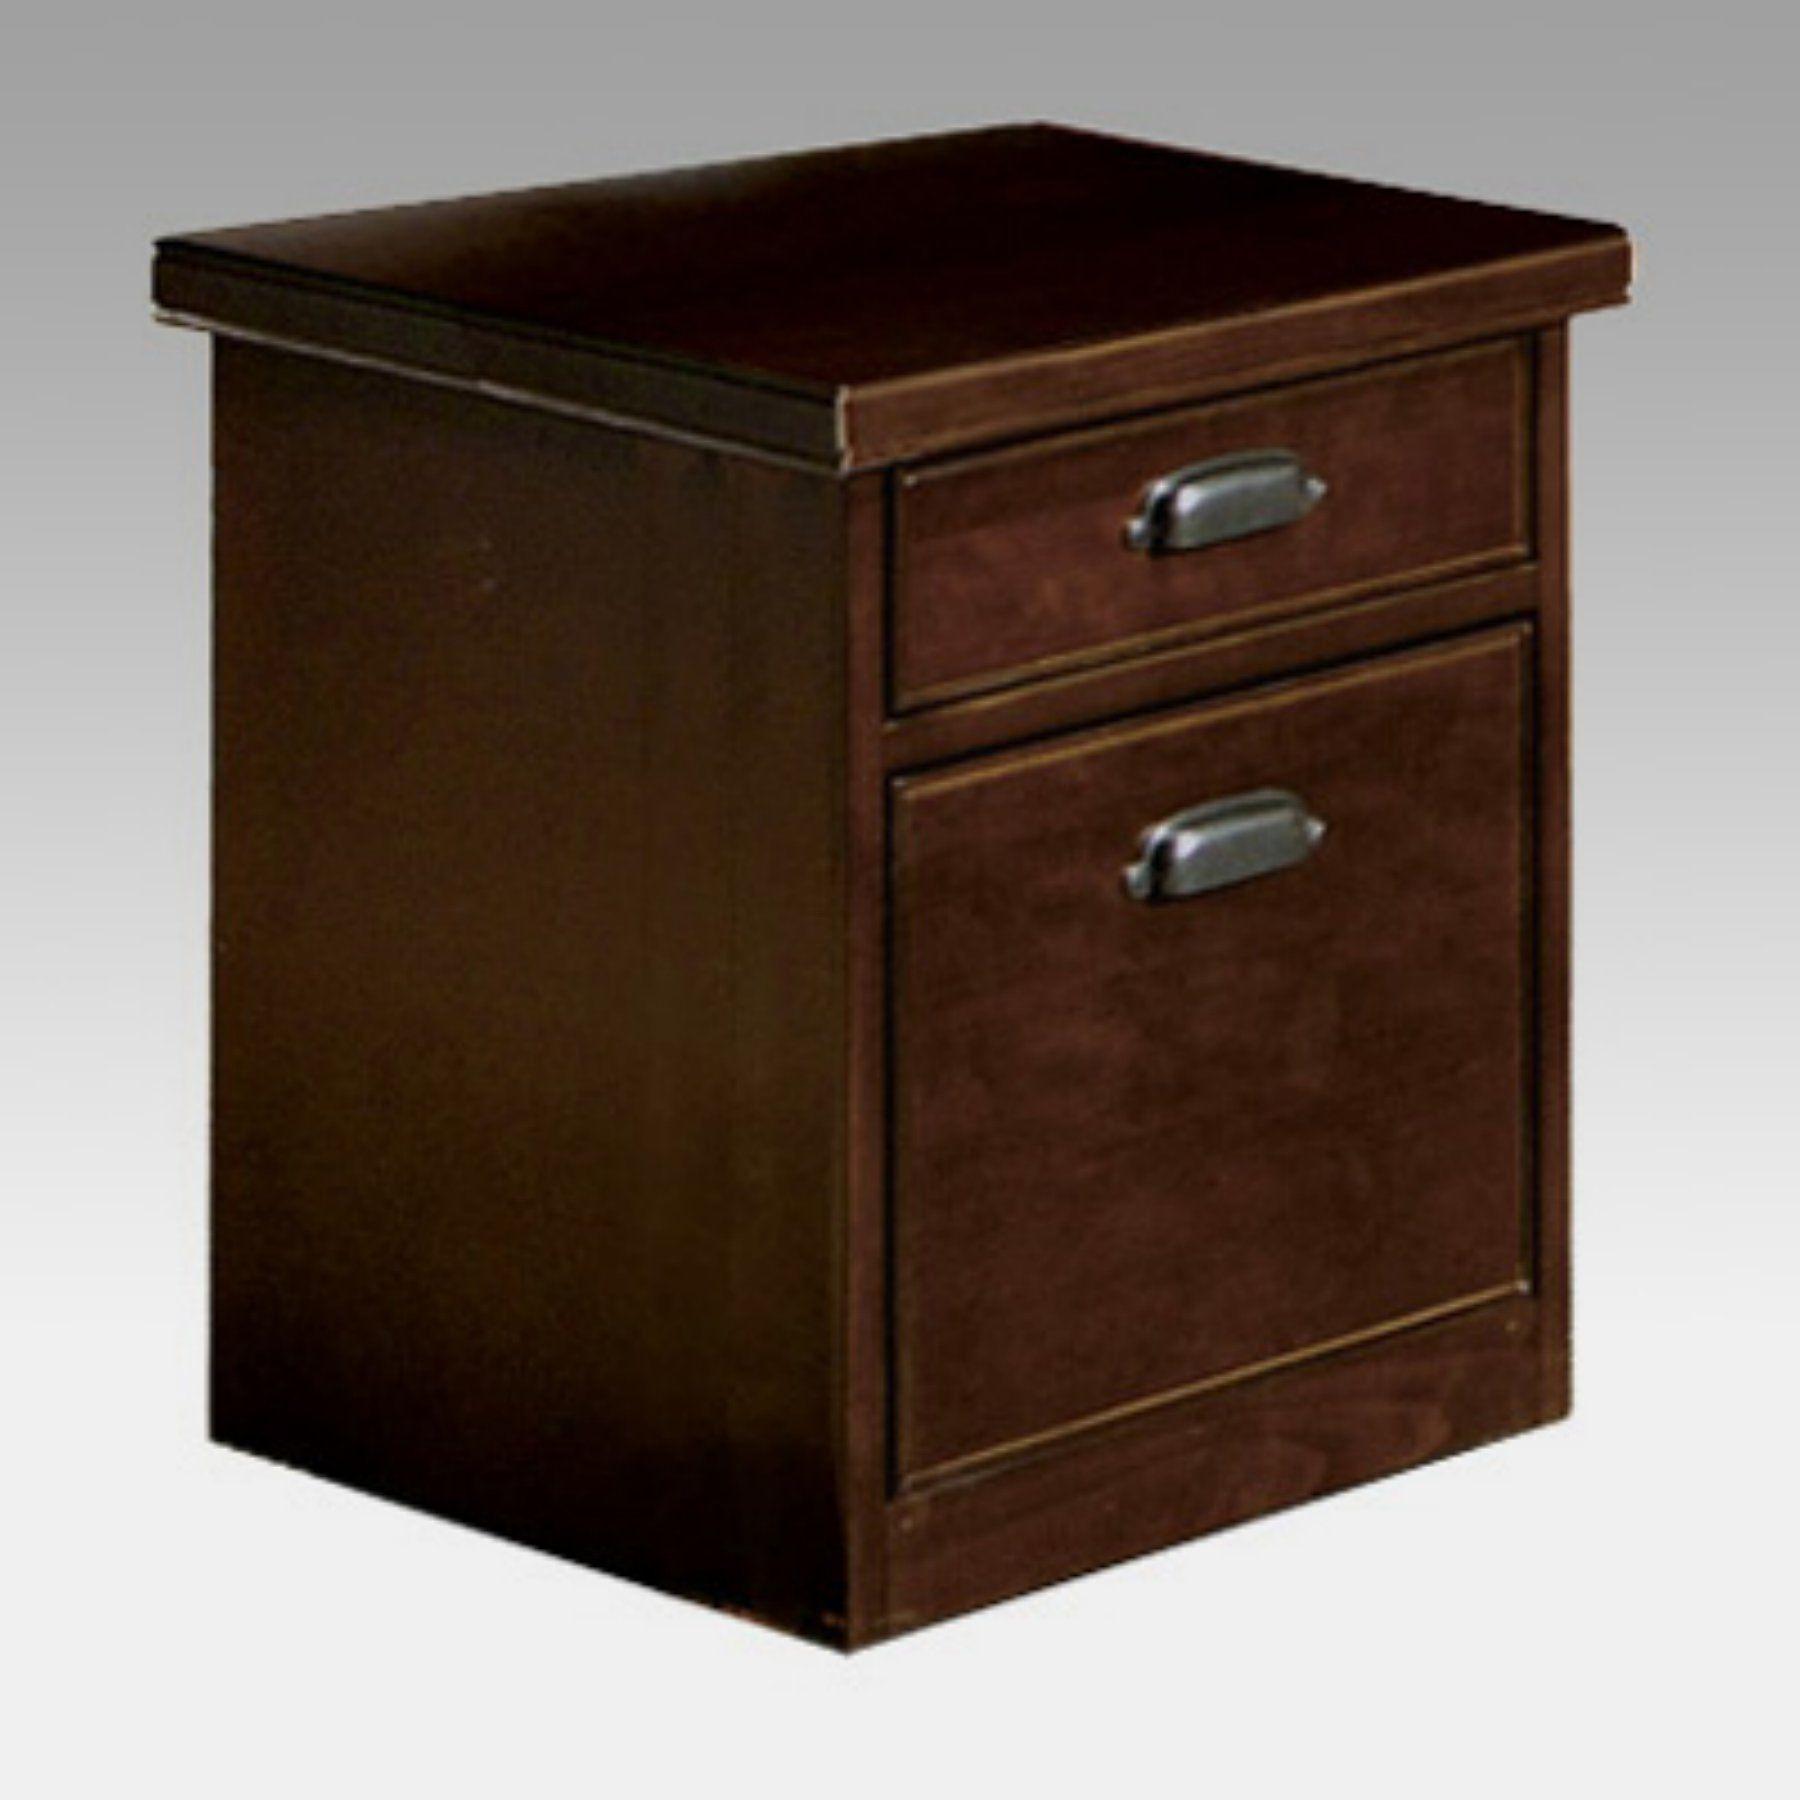 martin furniture tribeca loft 2 drawer file cabinet cherry rh pinterest com